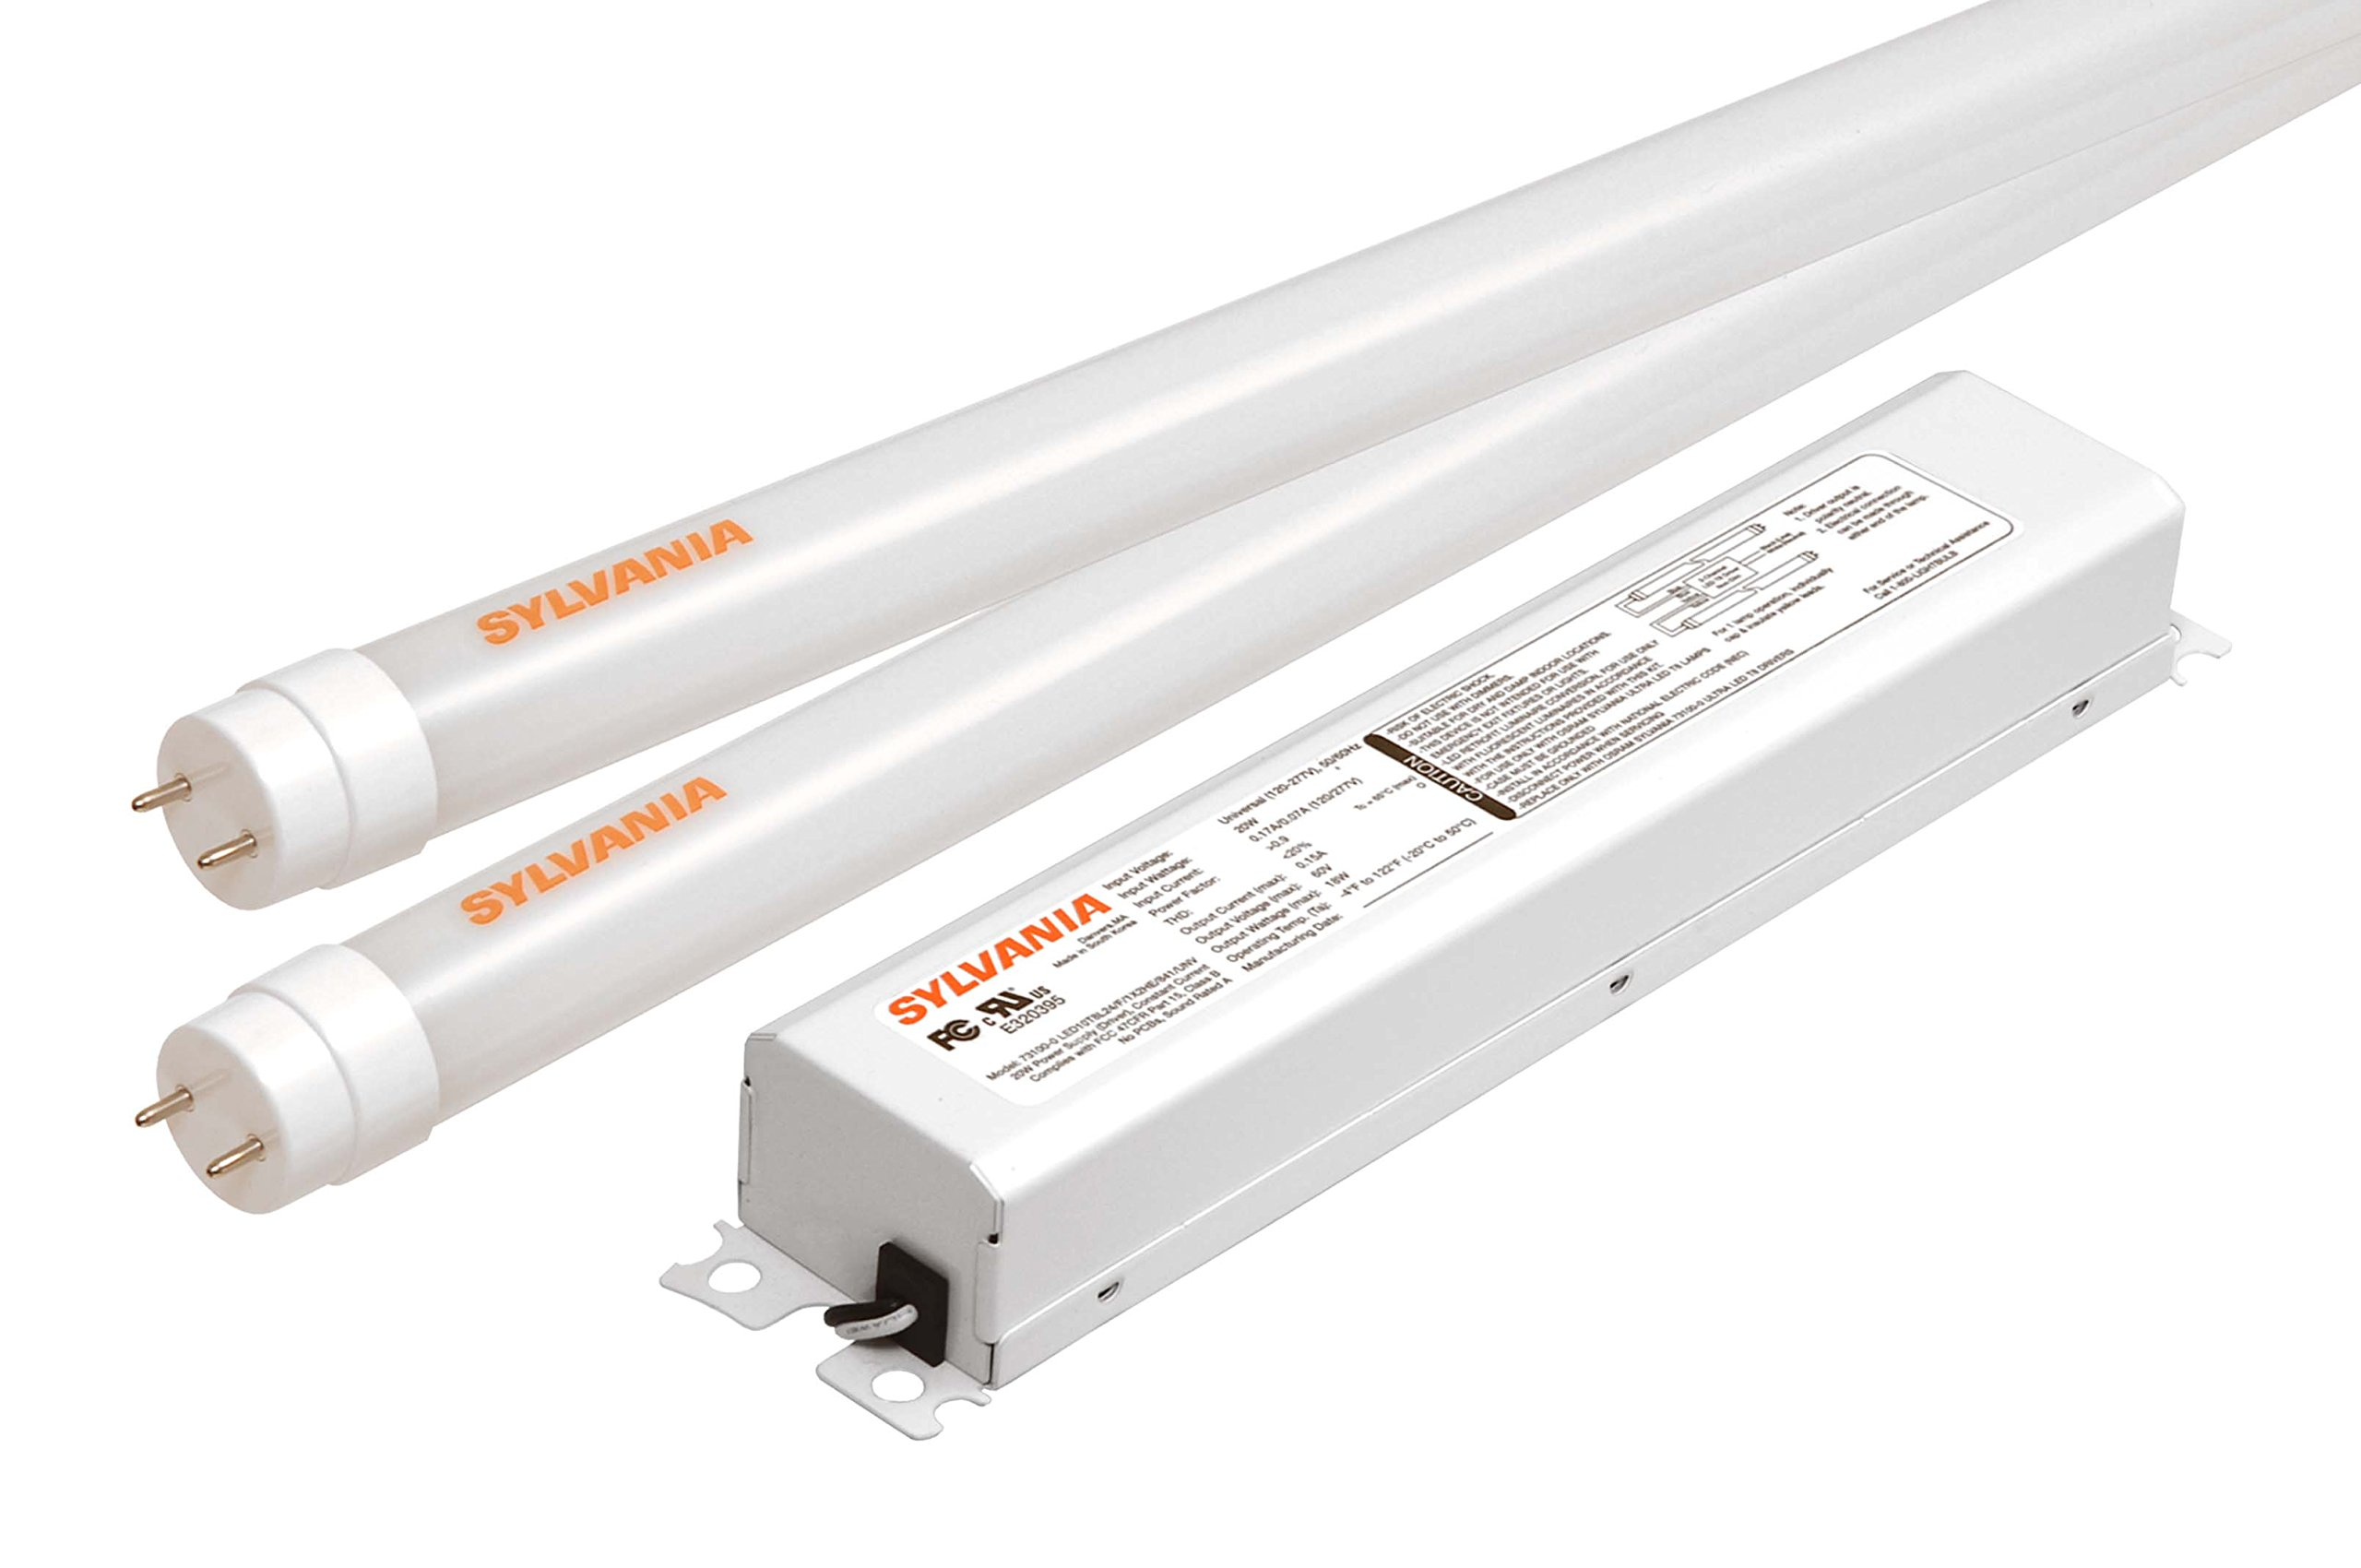 SYLVANIA Ultra HE LED T8 Retrofit Kit / Two Lamp LED Tubes replacing 2-Feet Fluorescent (T12 or T8) / Medium bi-pin base G13 / 10 Watt / 3500K – warm white by Sylvania Home Lighting